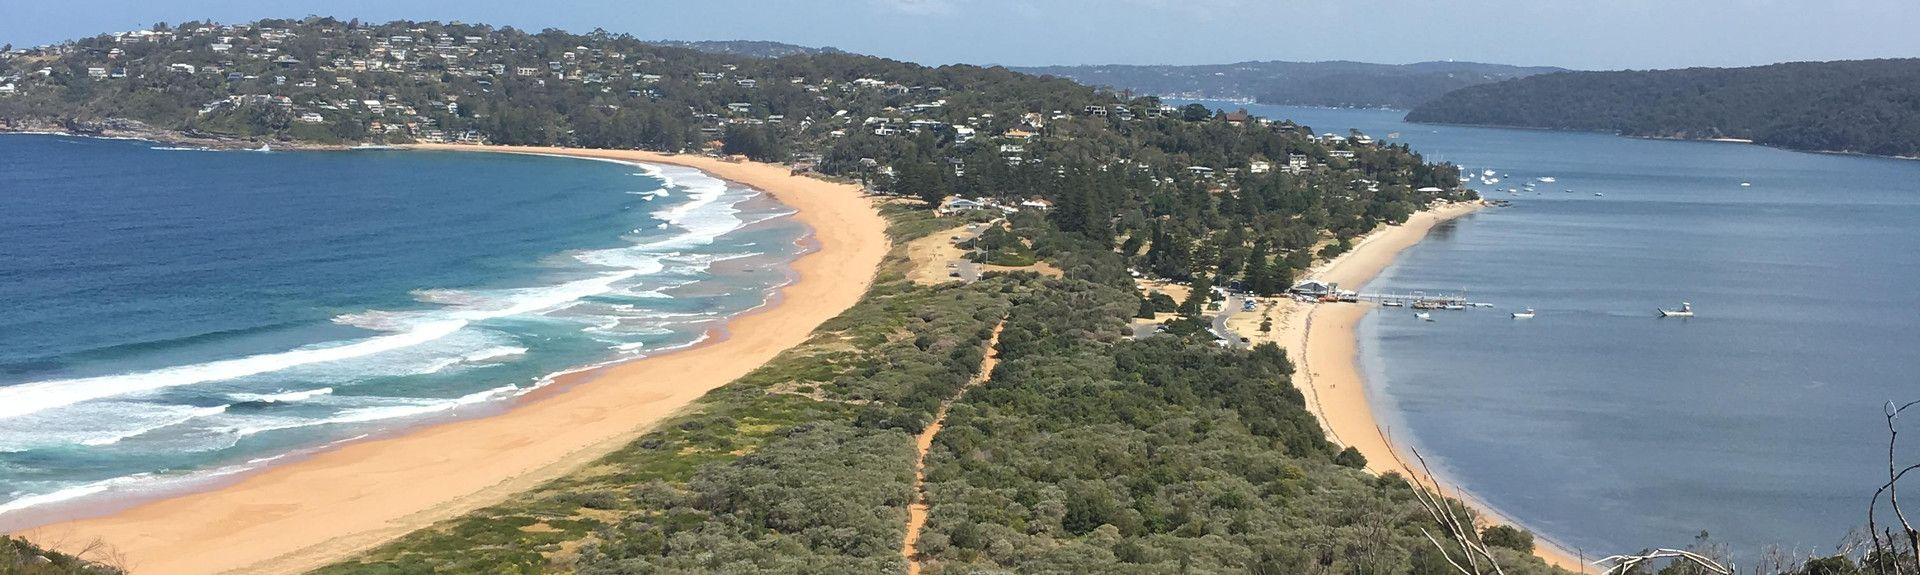 Scotland Island, Sydney, New South Wales, Australia